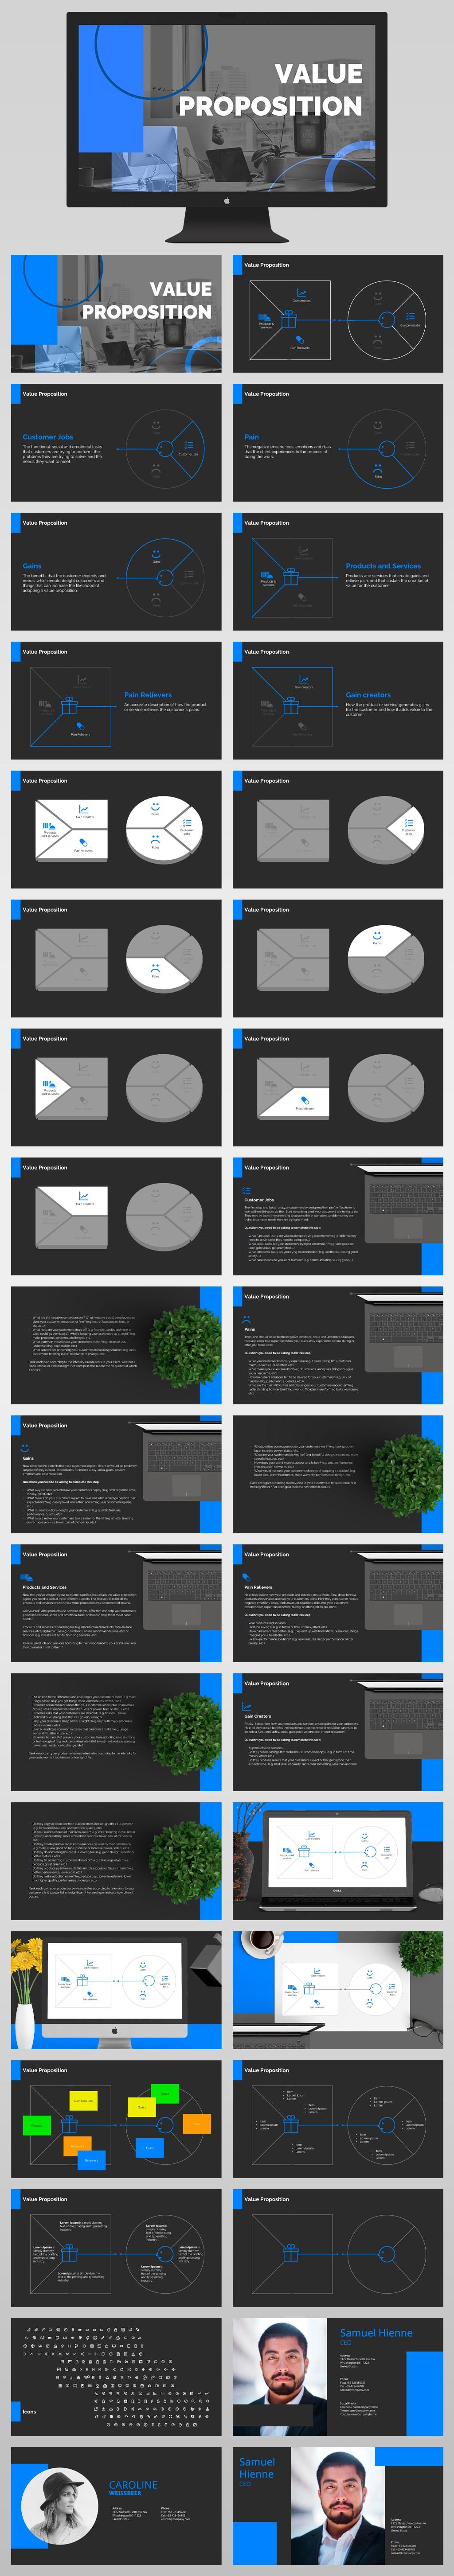 Value Presentation Template Powerpoint All Slides Dar